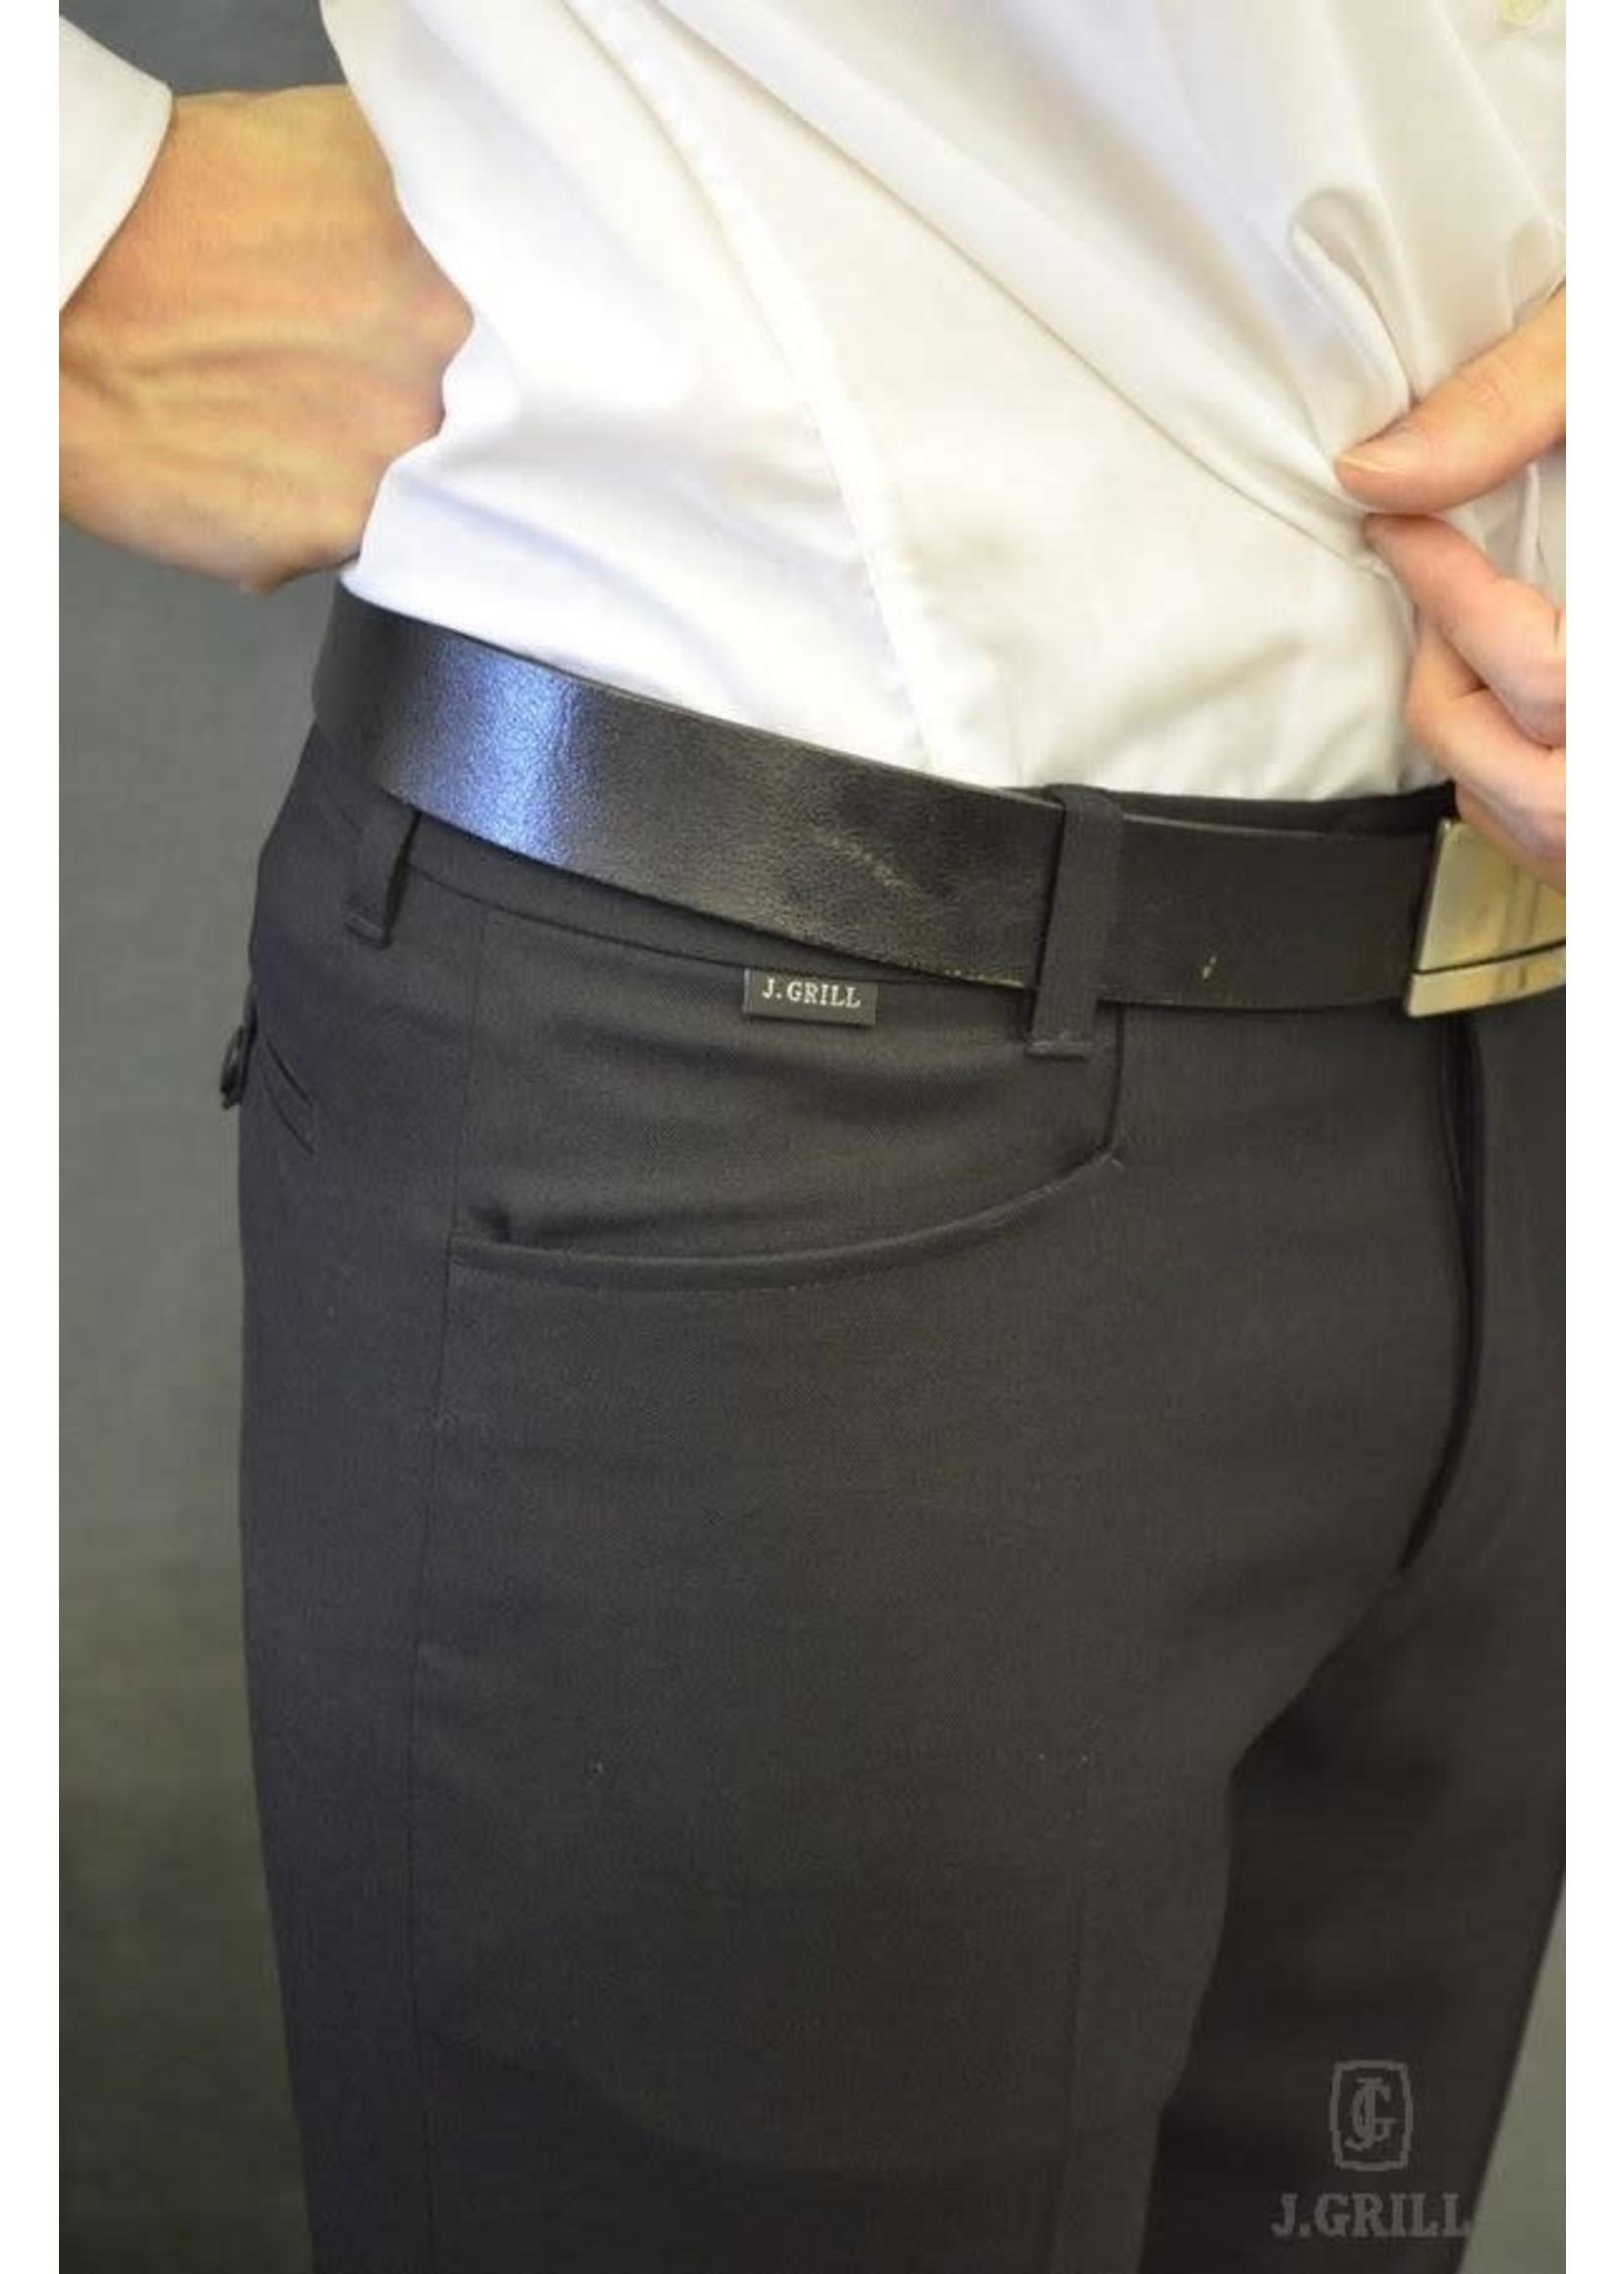 J Grill J.GRILL Trousers – Daniel Style (Full Top Pocket)